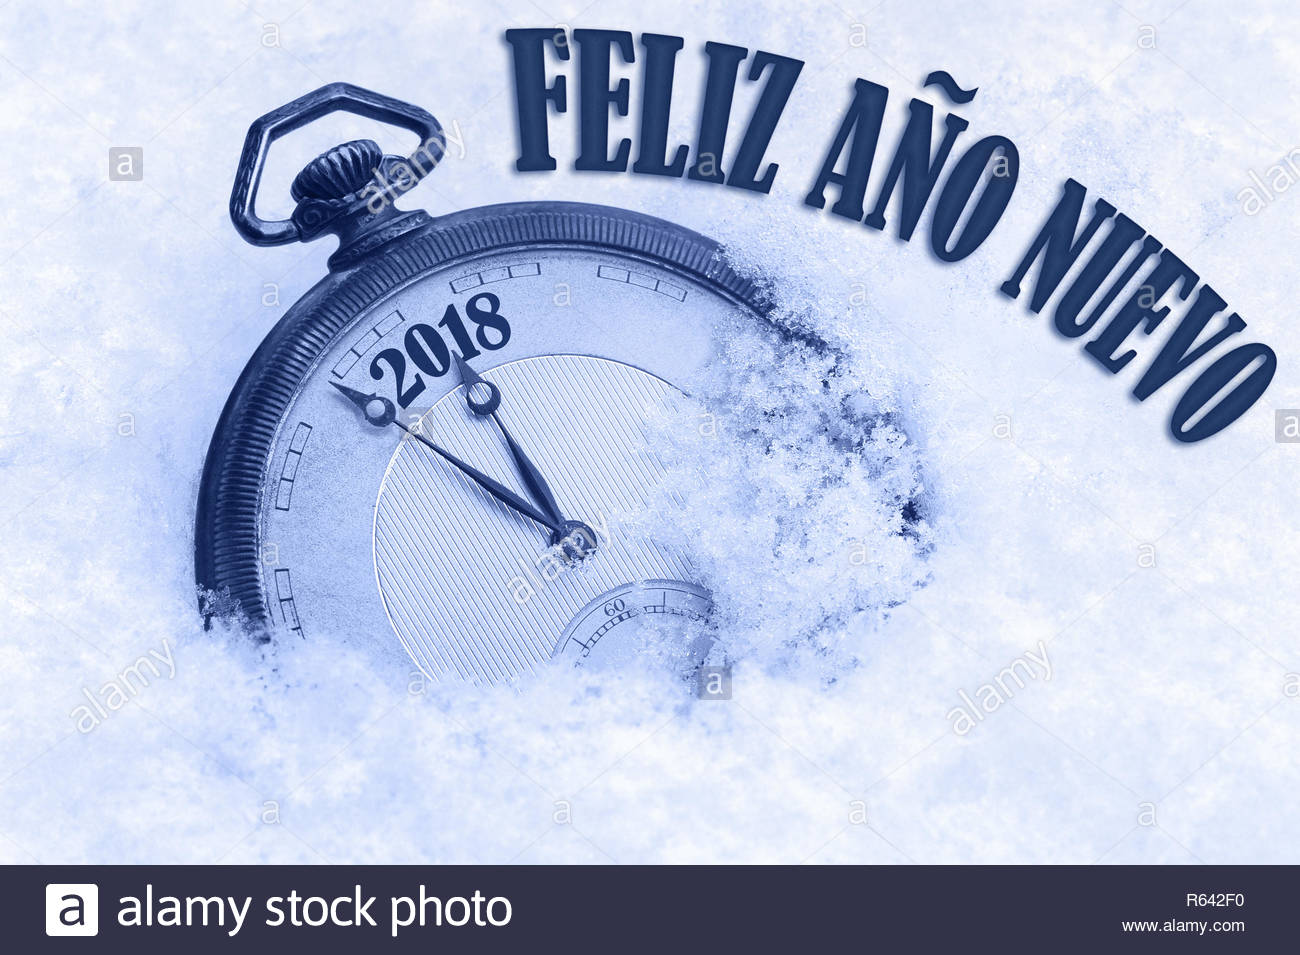 2018 greeting, Happy New Year in Spanish language, Feliz ano nuevo text - Stock Image